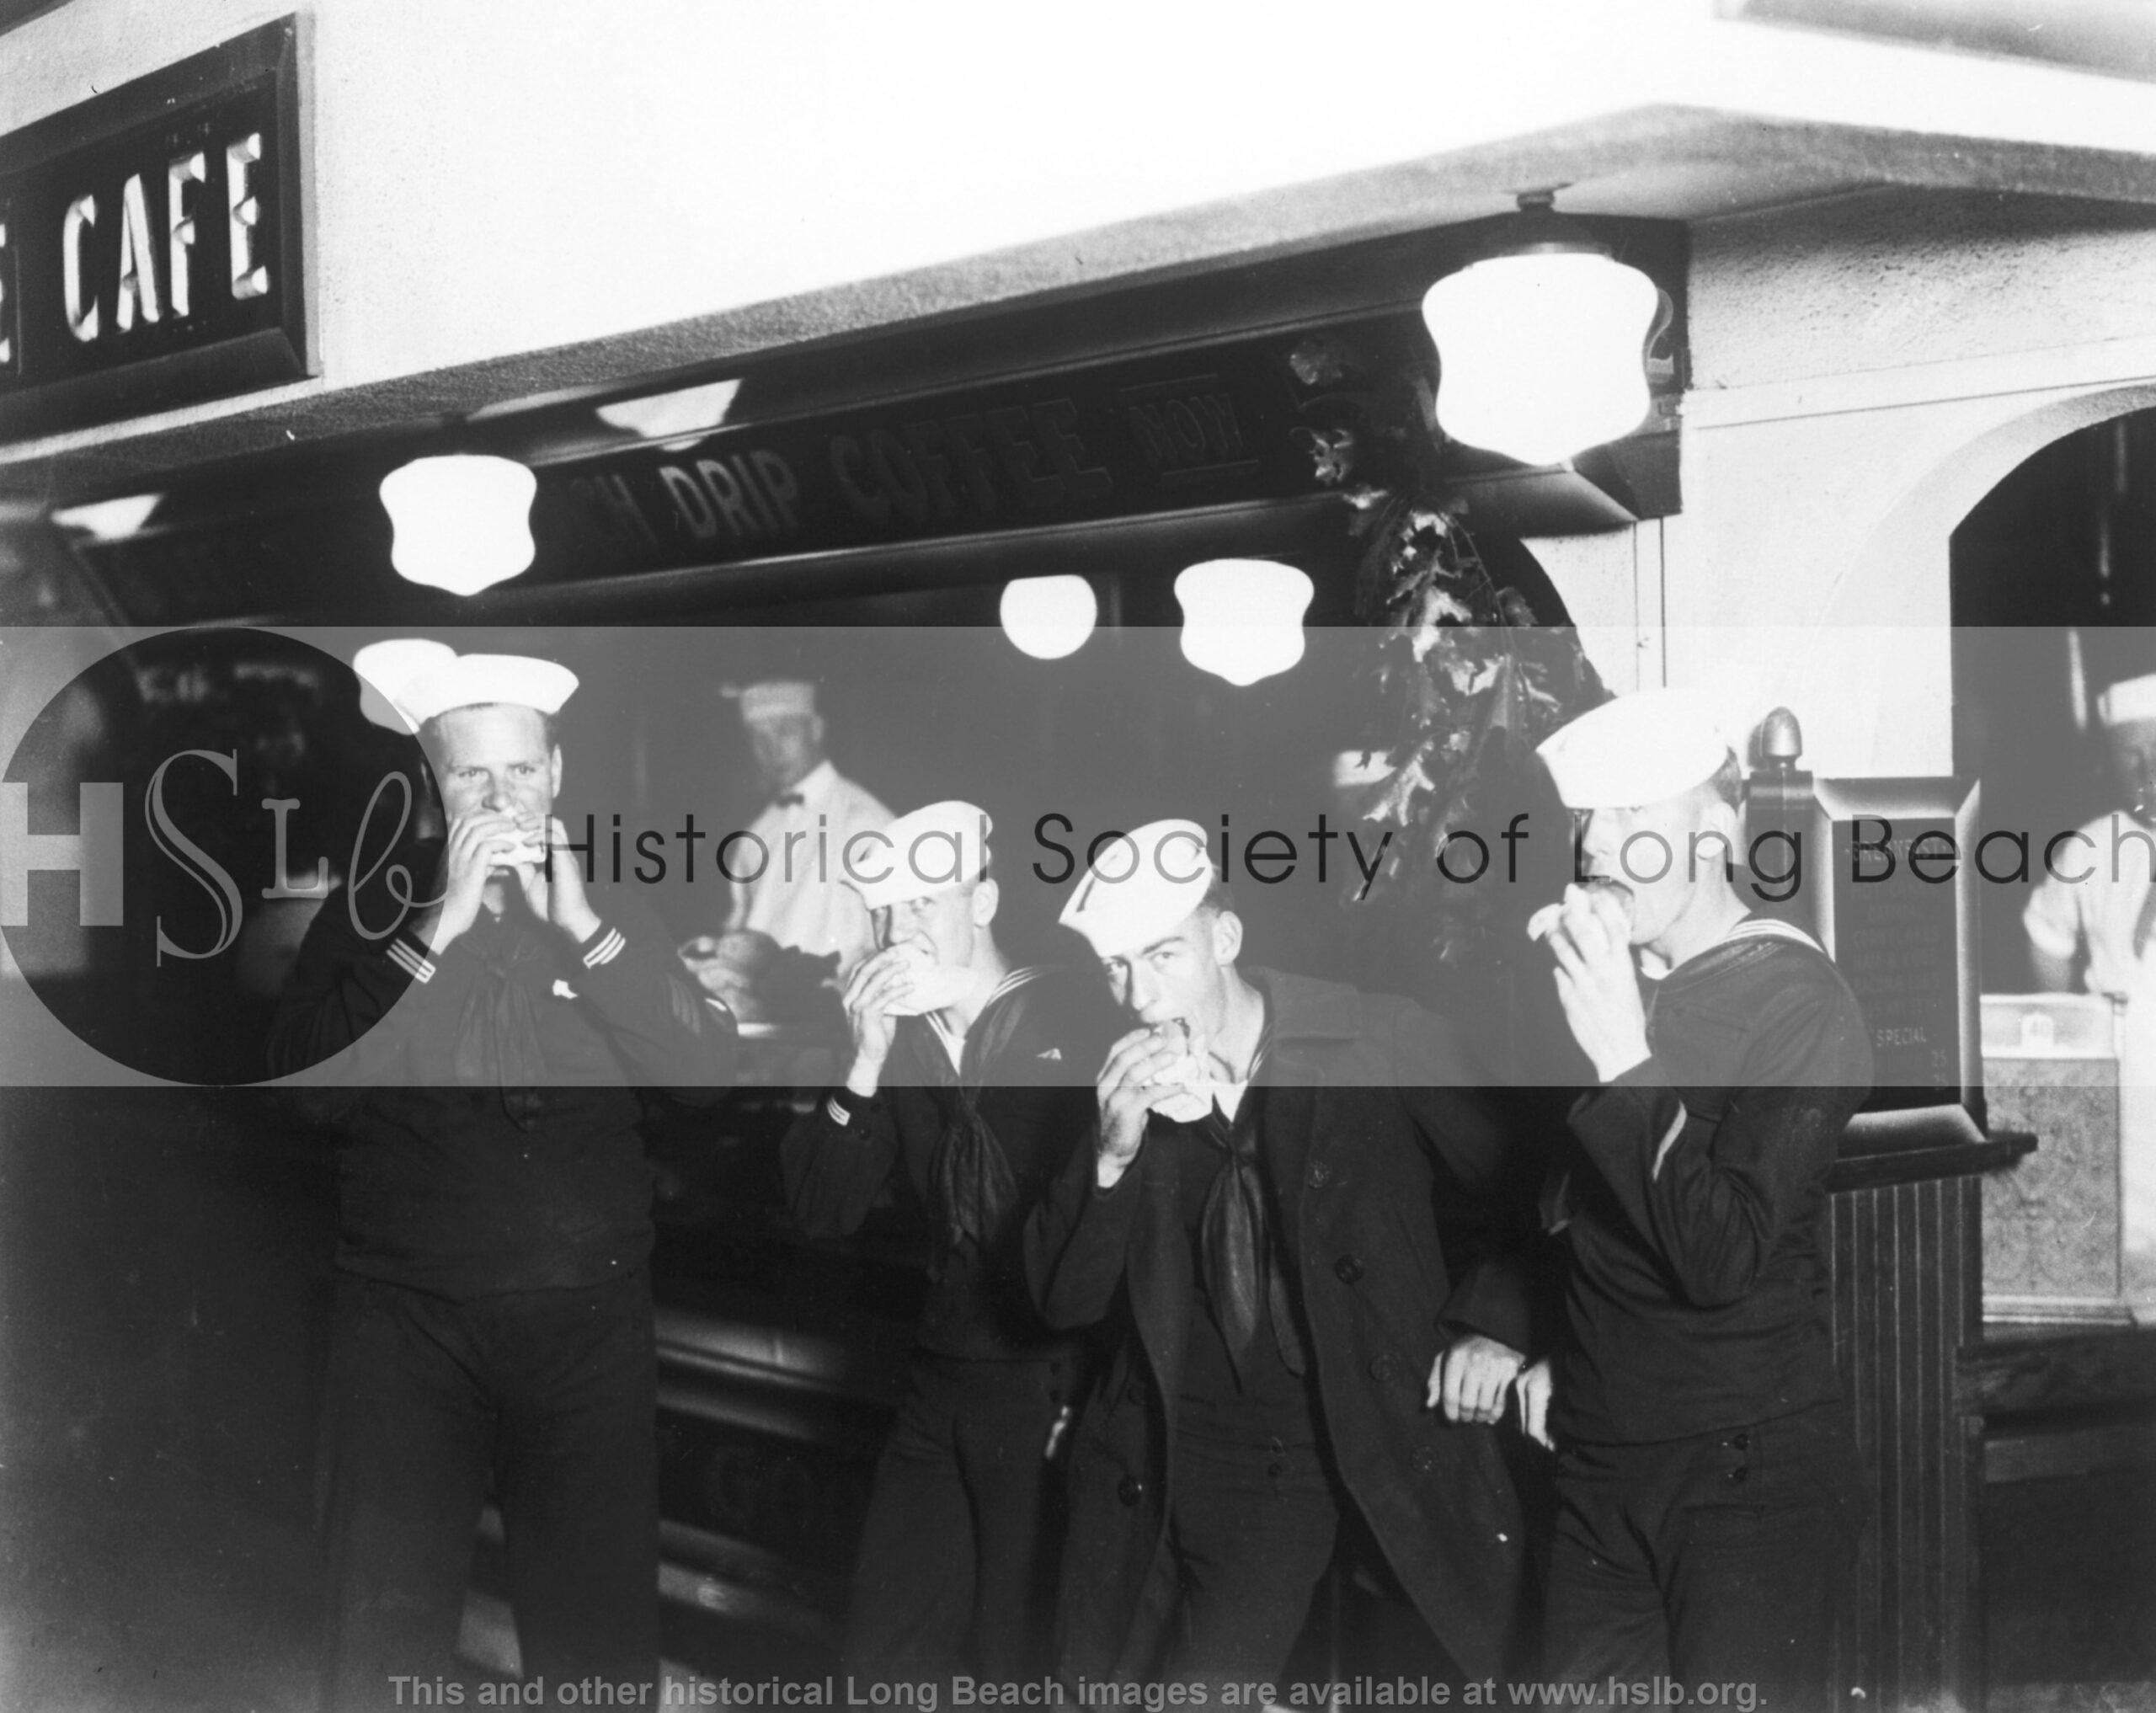 Sailors eating burgers, c. 1937